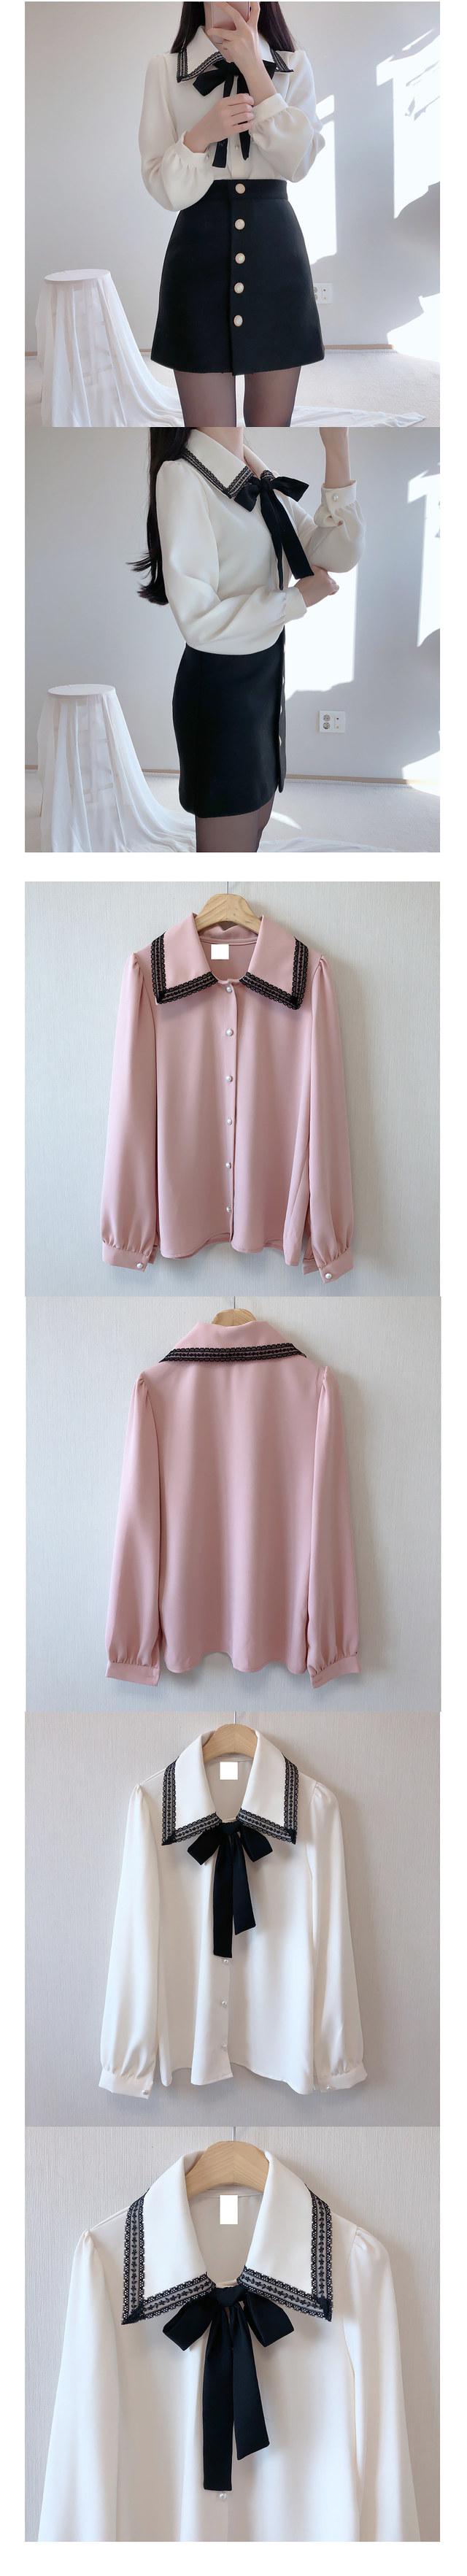 Louisville Ribbon blouse